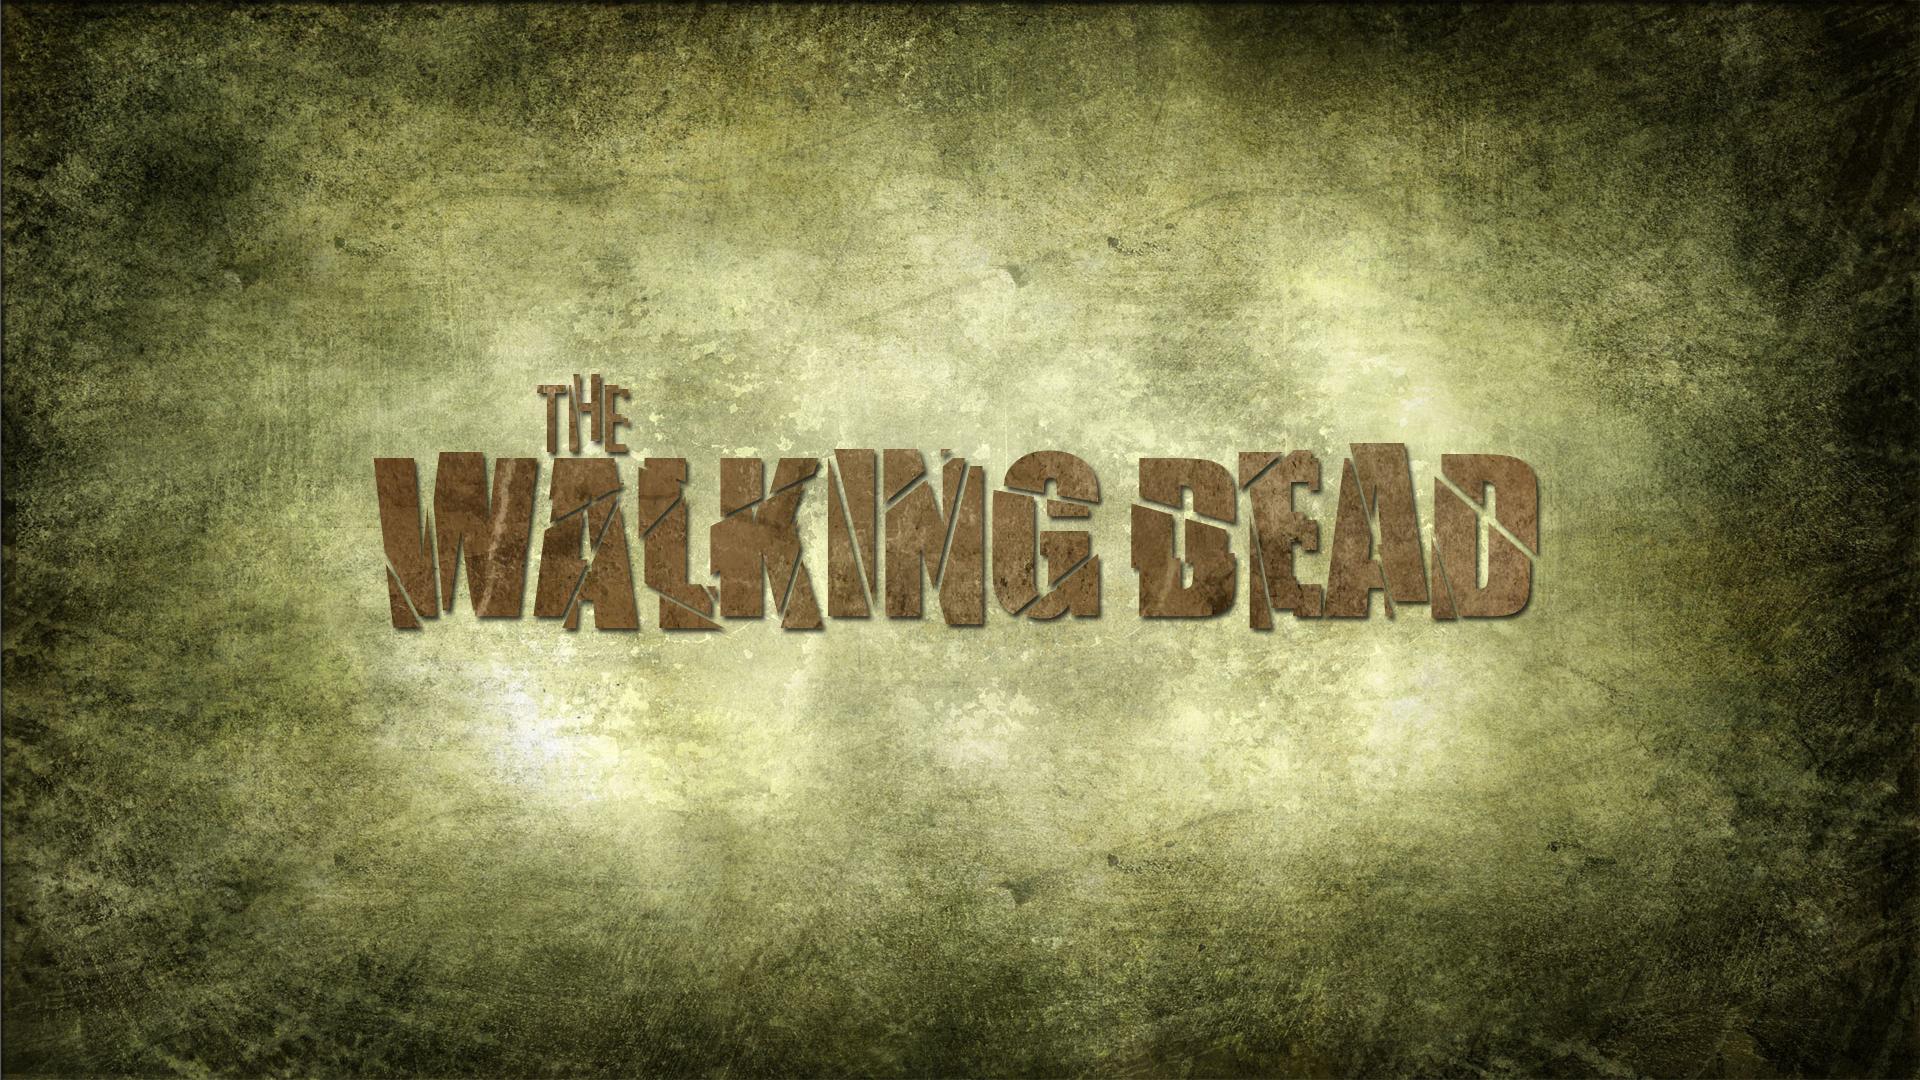 the walking dead game wallpaper 1366x768